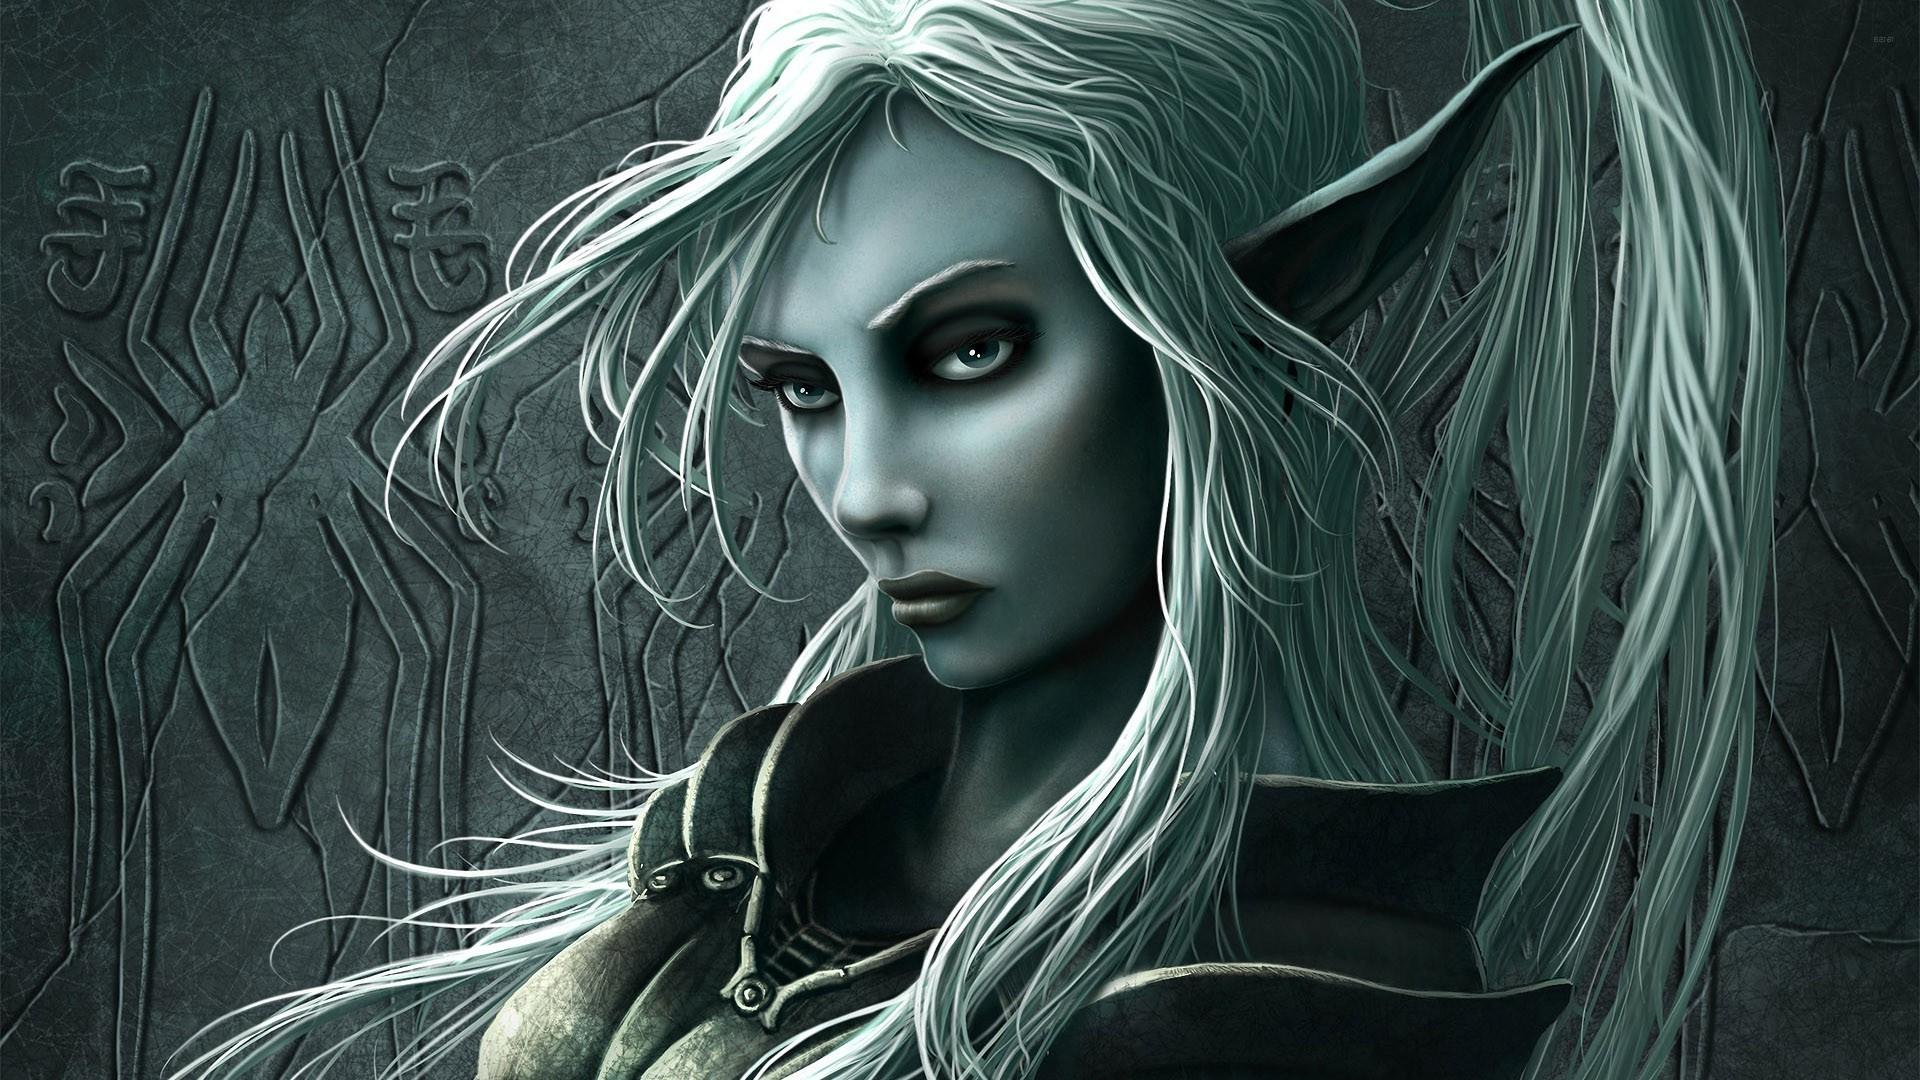 Elf woman wallpaper 15332 1920x1080